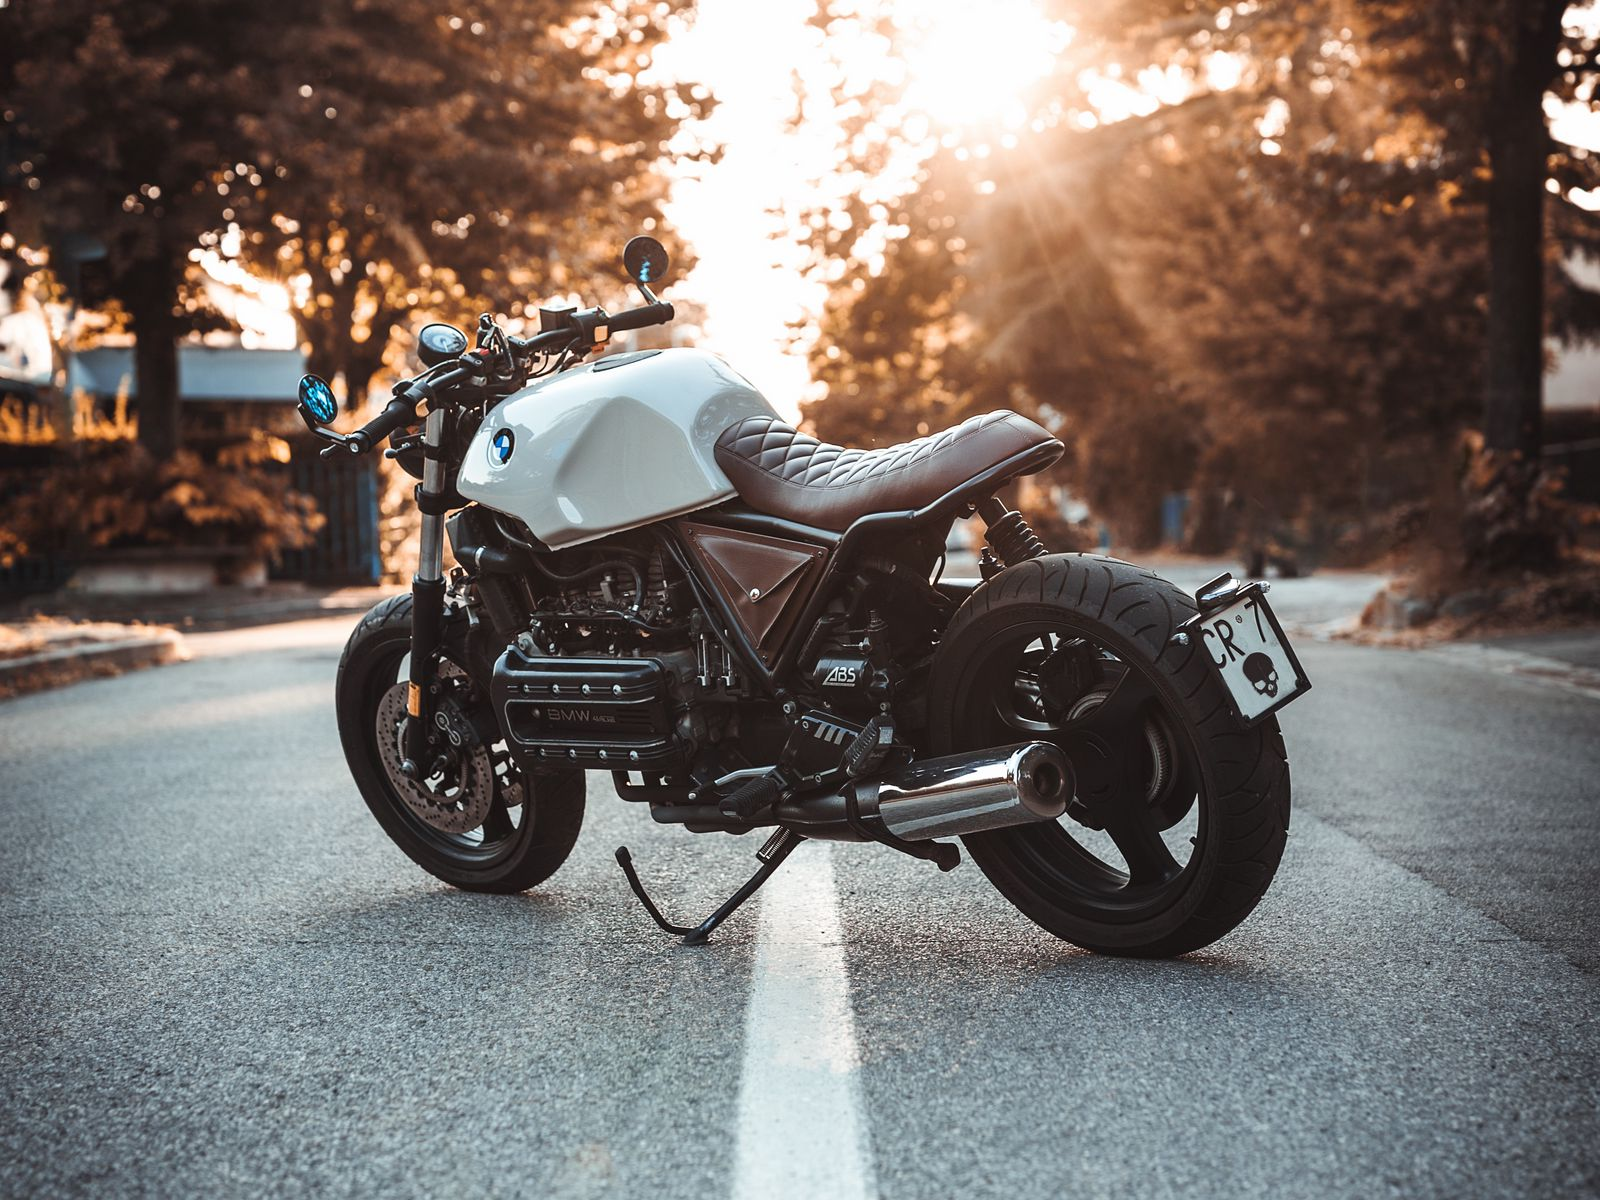 1600x1200 Обои bmw k100, мотоцикл, байк, вид сбоку